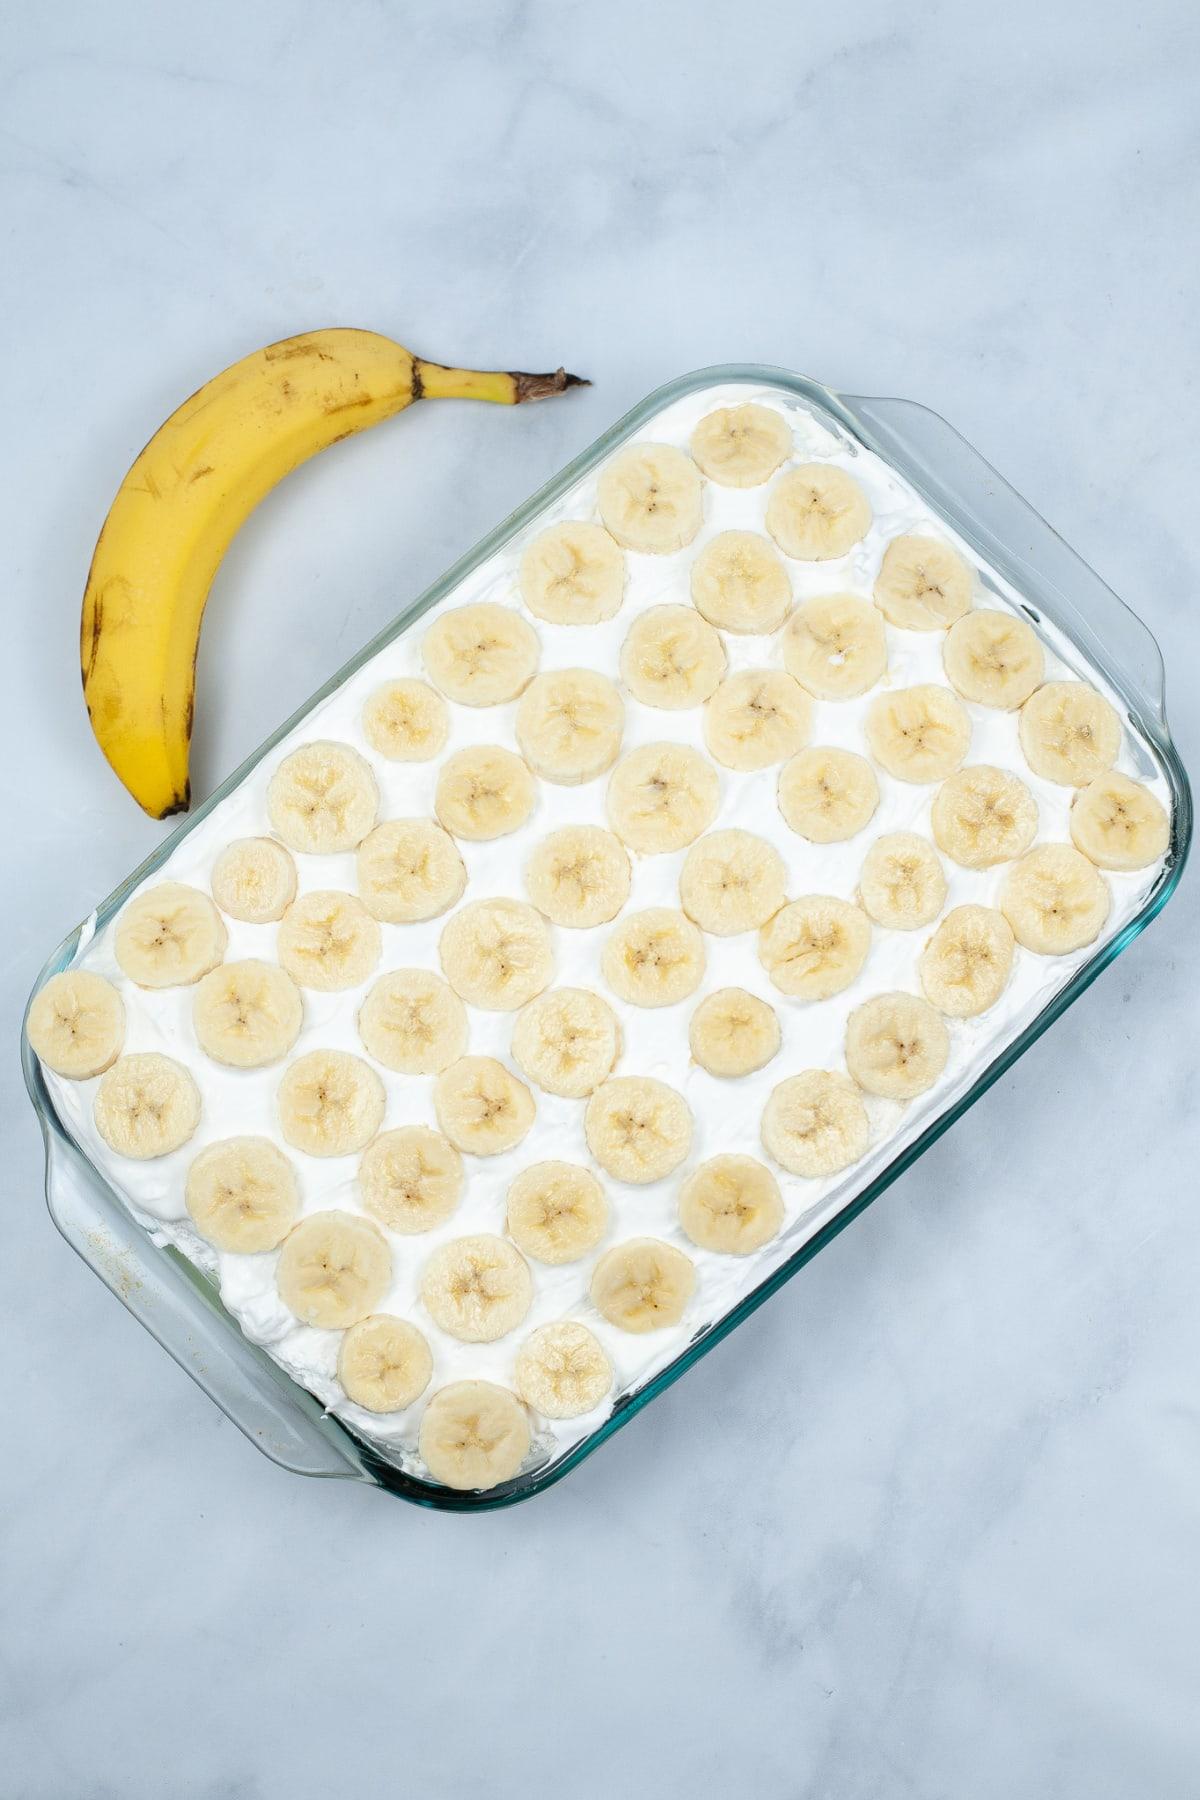 poke cake with sliced bananas